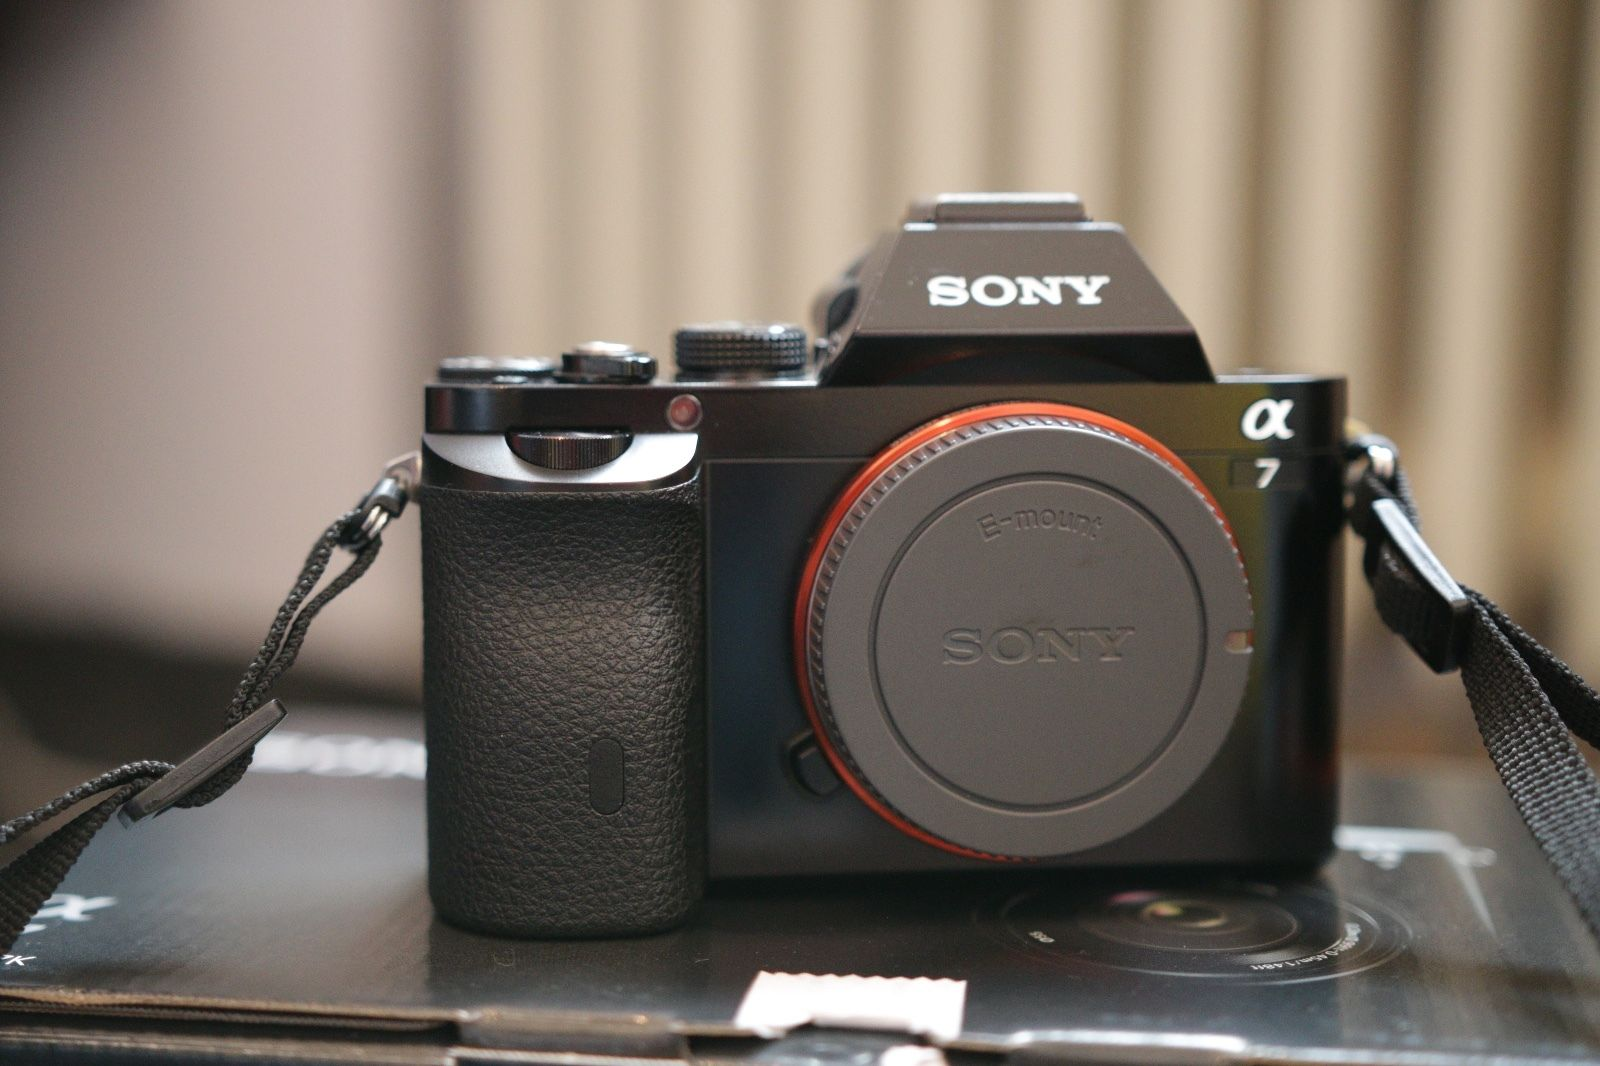 Sony Alpha ILCE-7 24.3 MP SLR-Digitalkamera -Schwarz + Batteriegriff